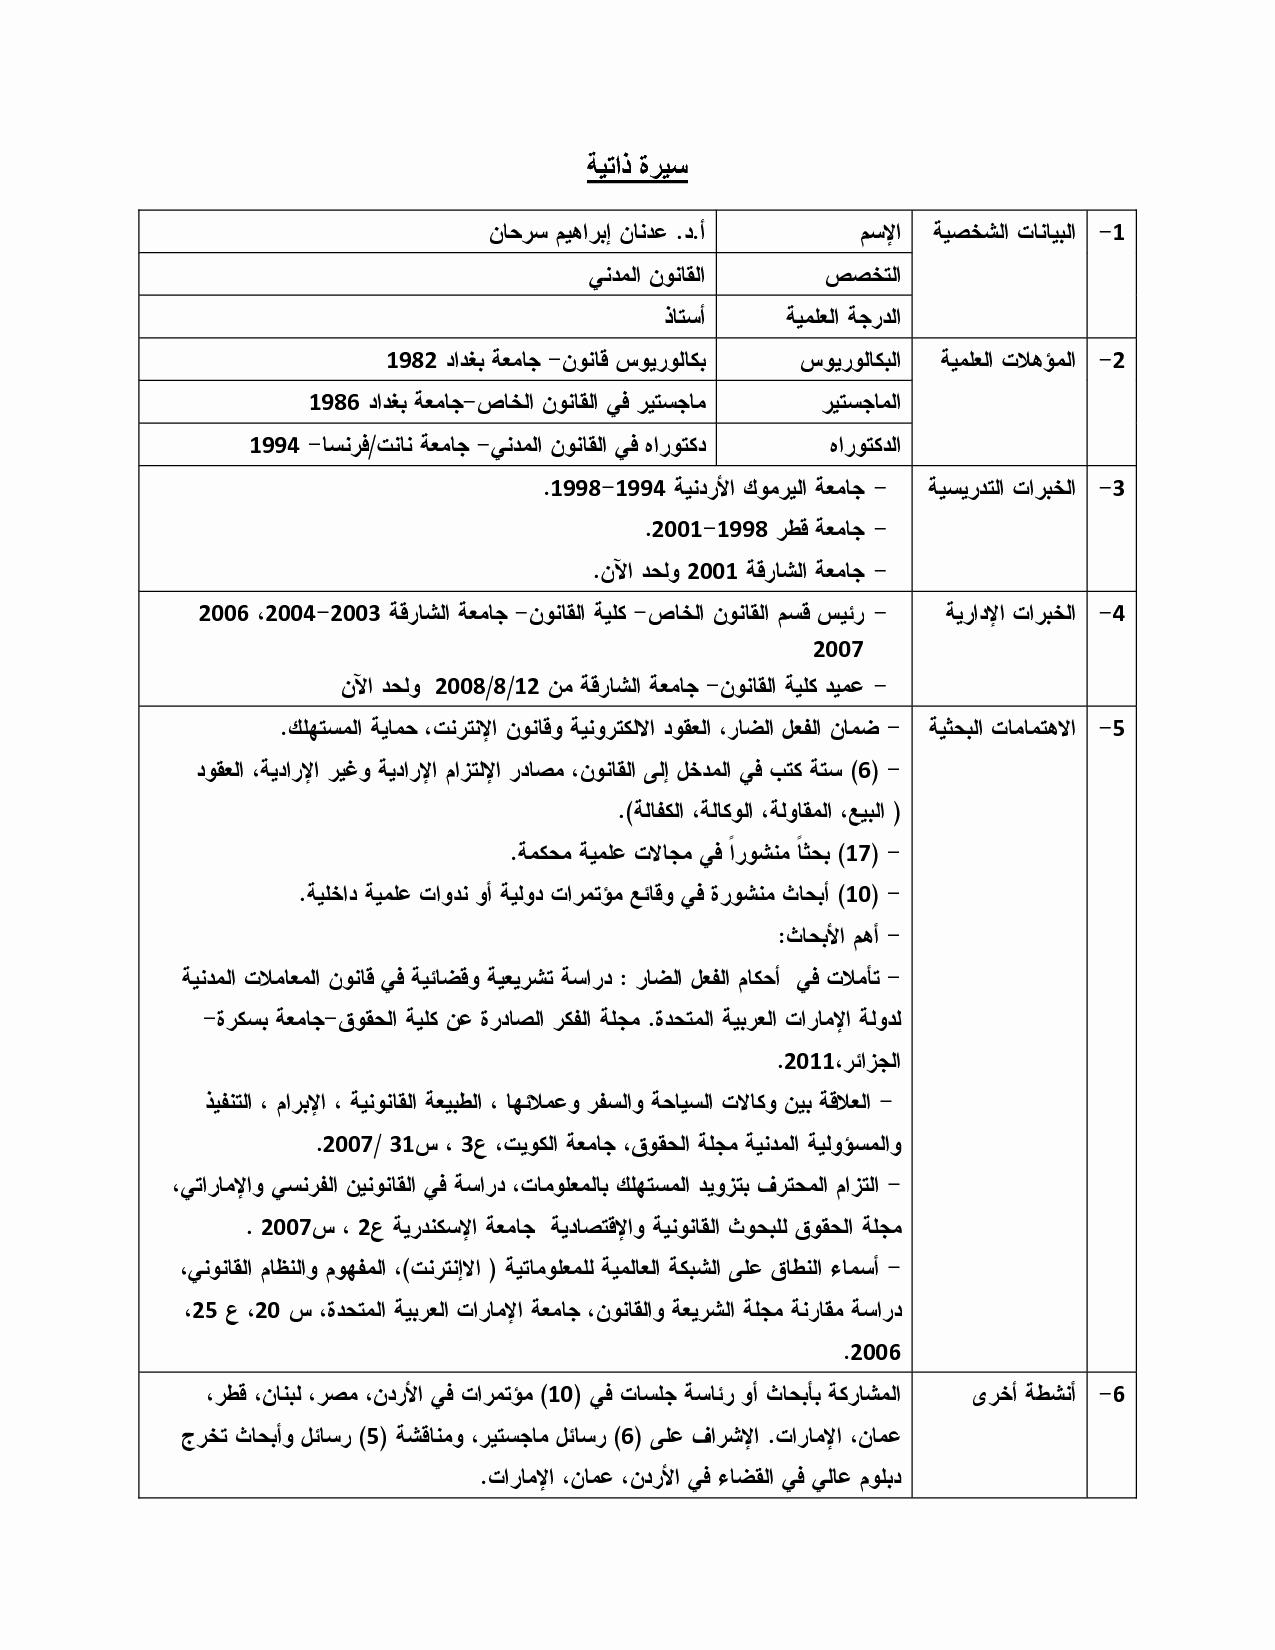 Curriculum Vitae Template Word Beautiful Cv Template Word In Arabic